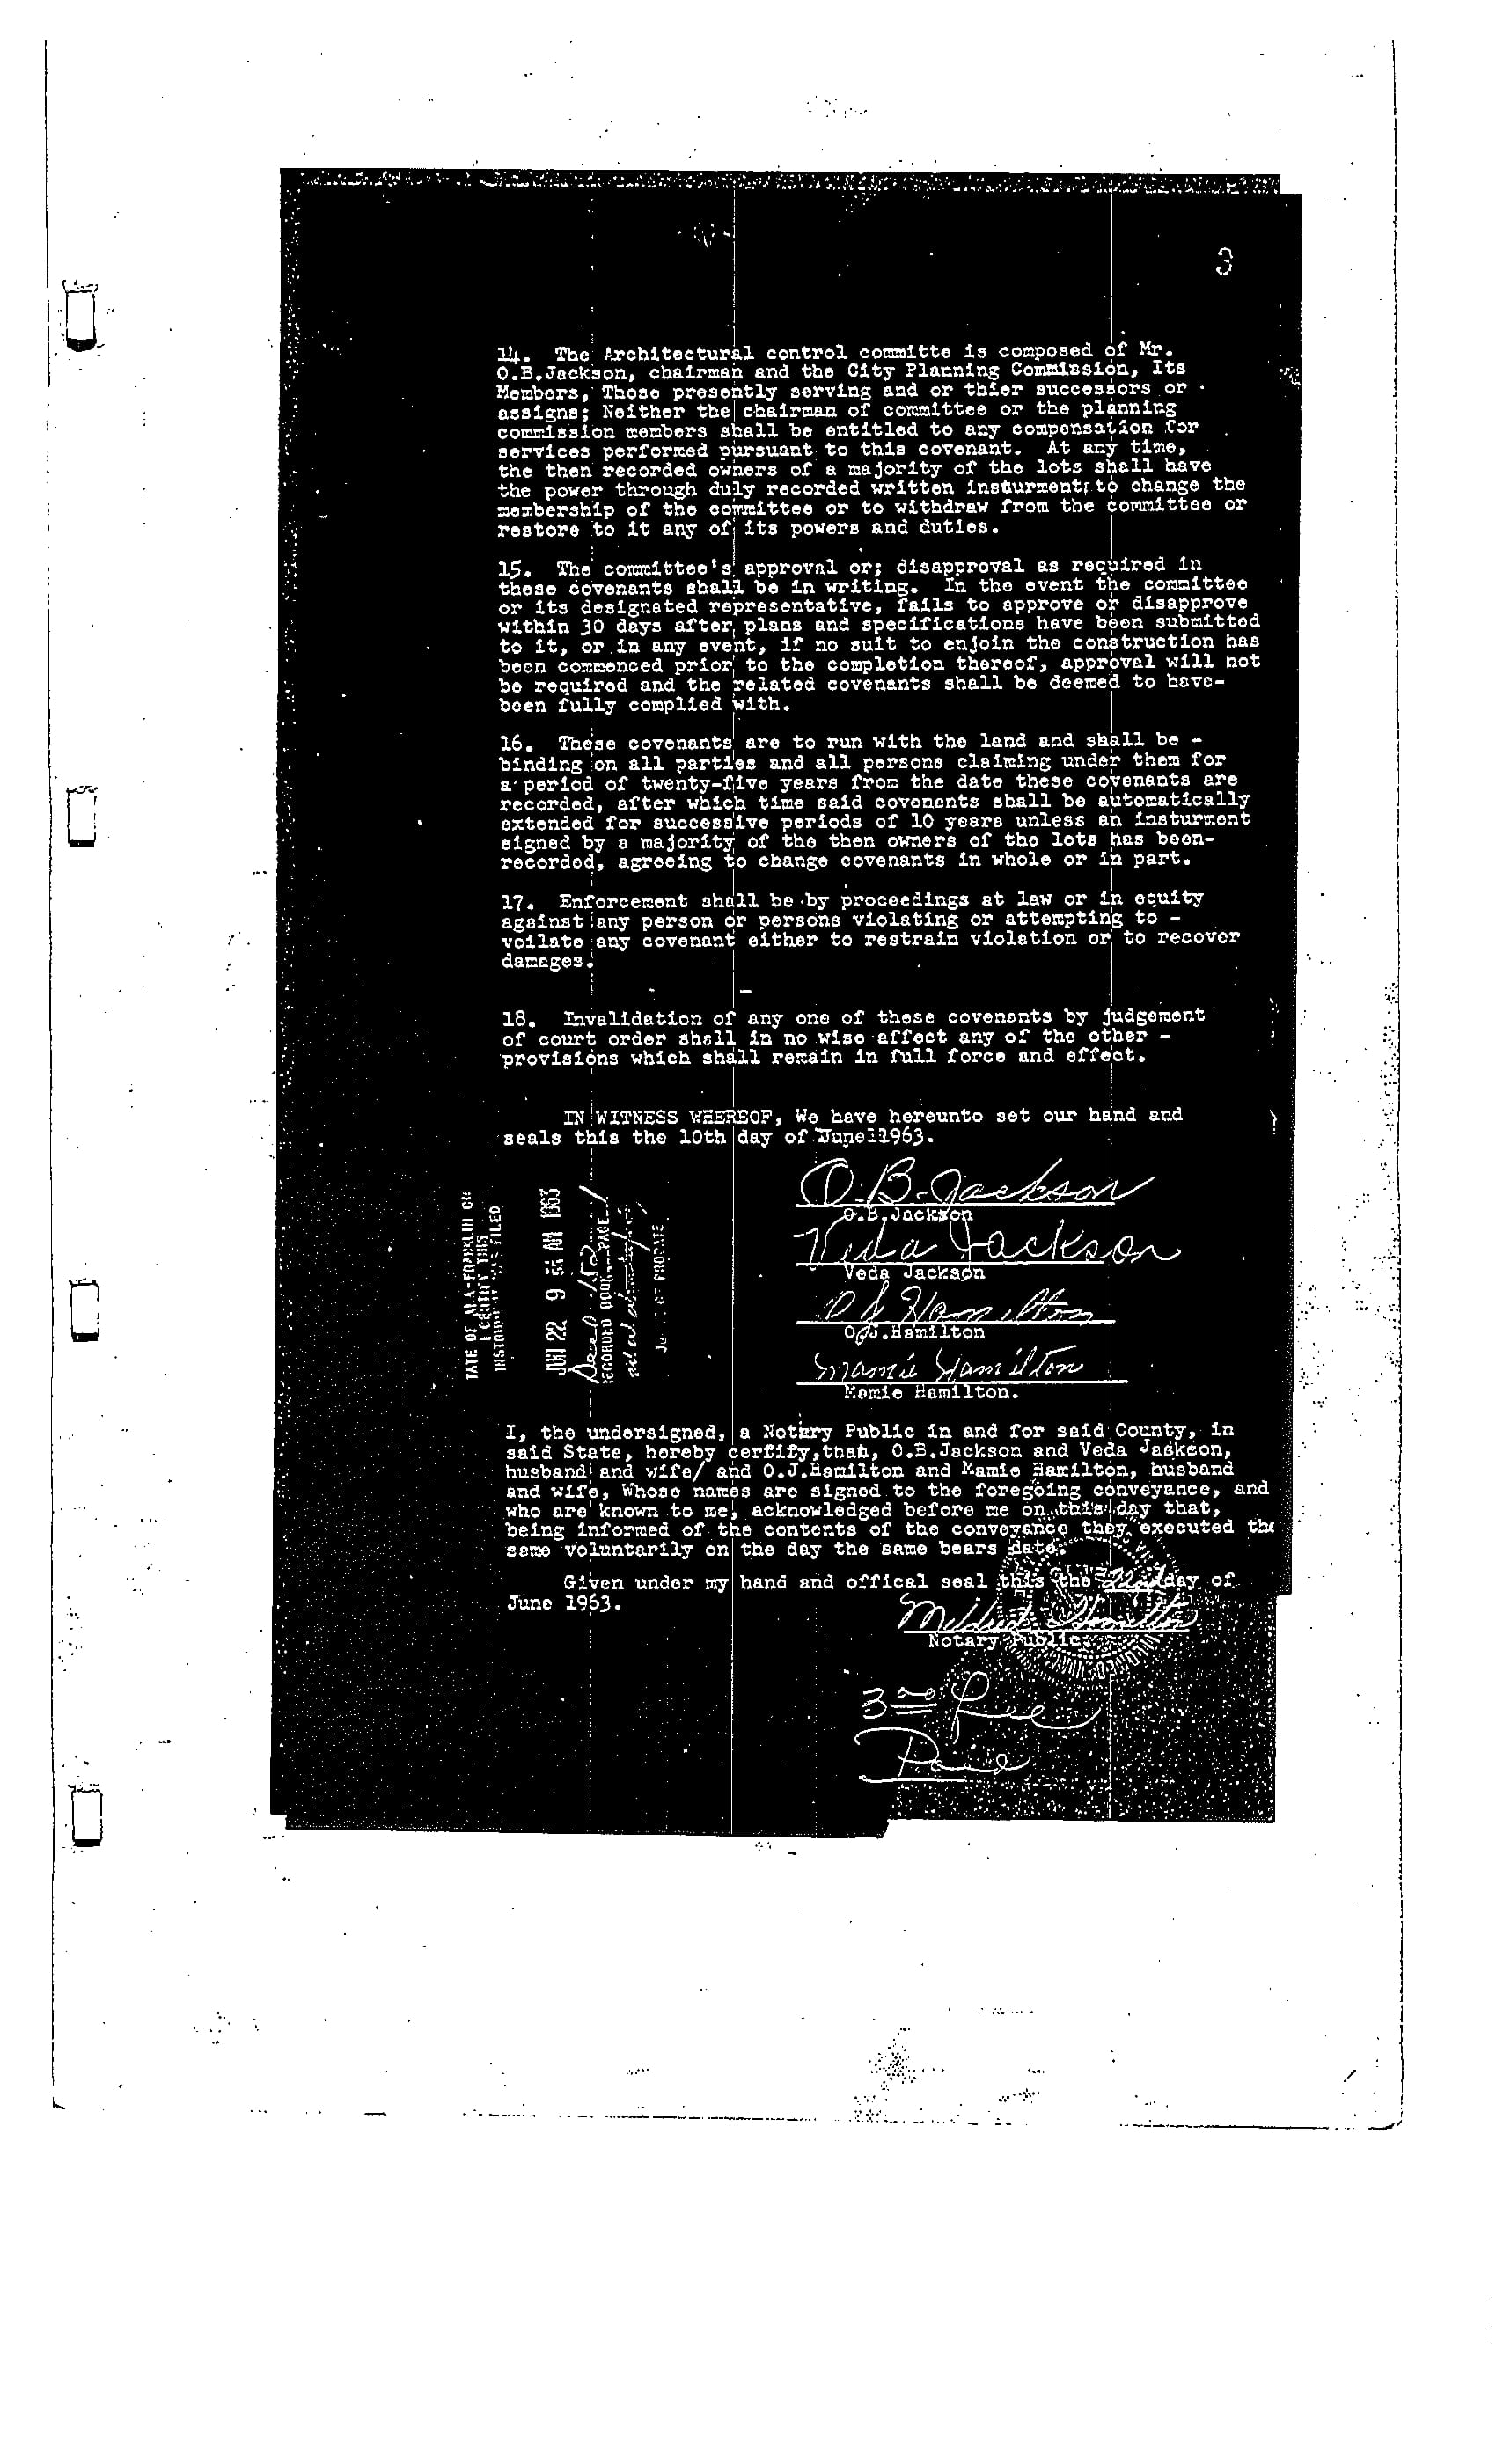 Covenants-City-Lake-Subdivision-Franklin-Co-3.jpg